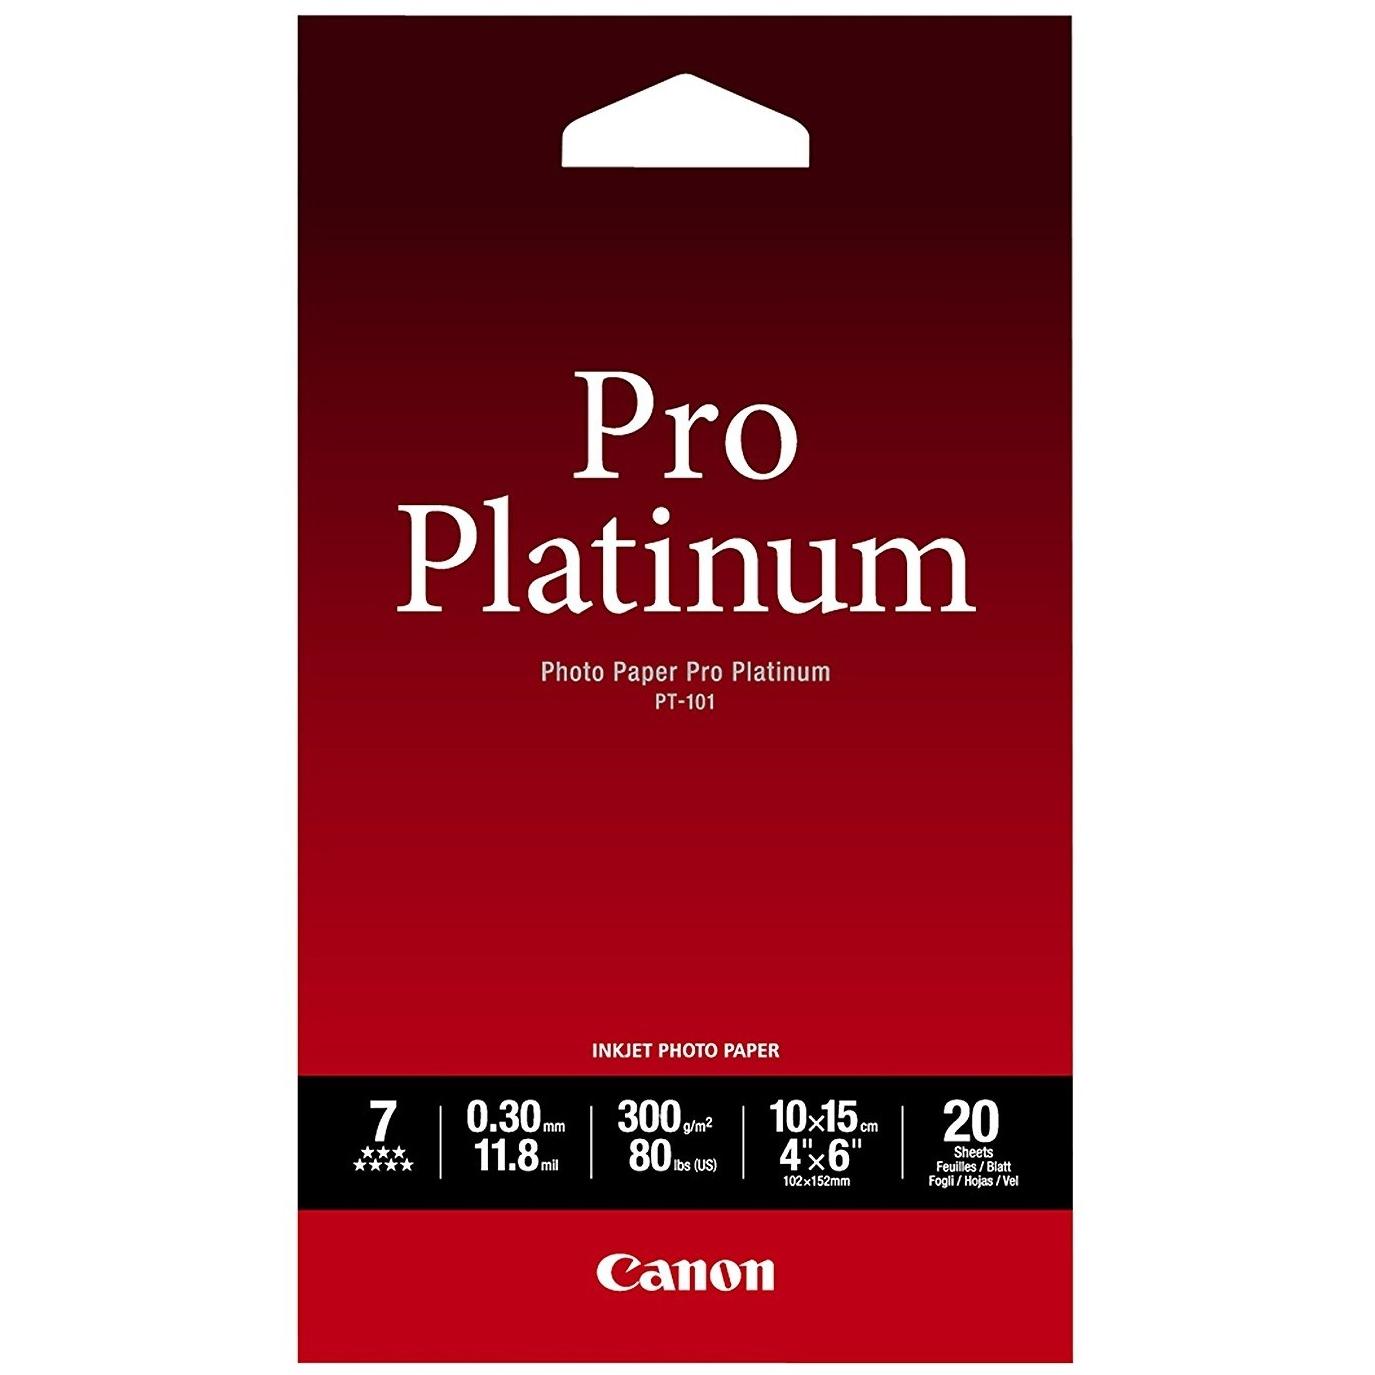 Original Canon PT-101 300gsm A6 Pro Platinum II Photo Paper - 20 Sheets (2768B013)